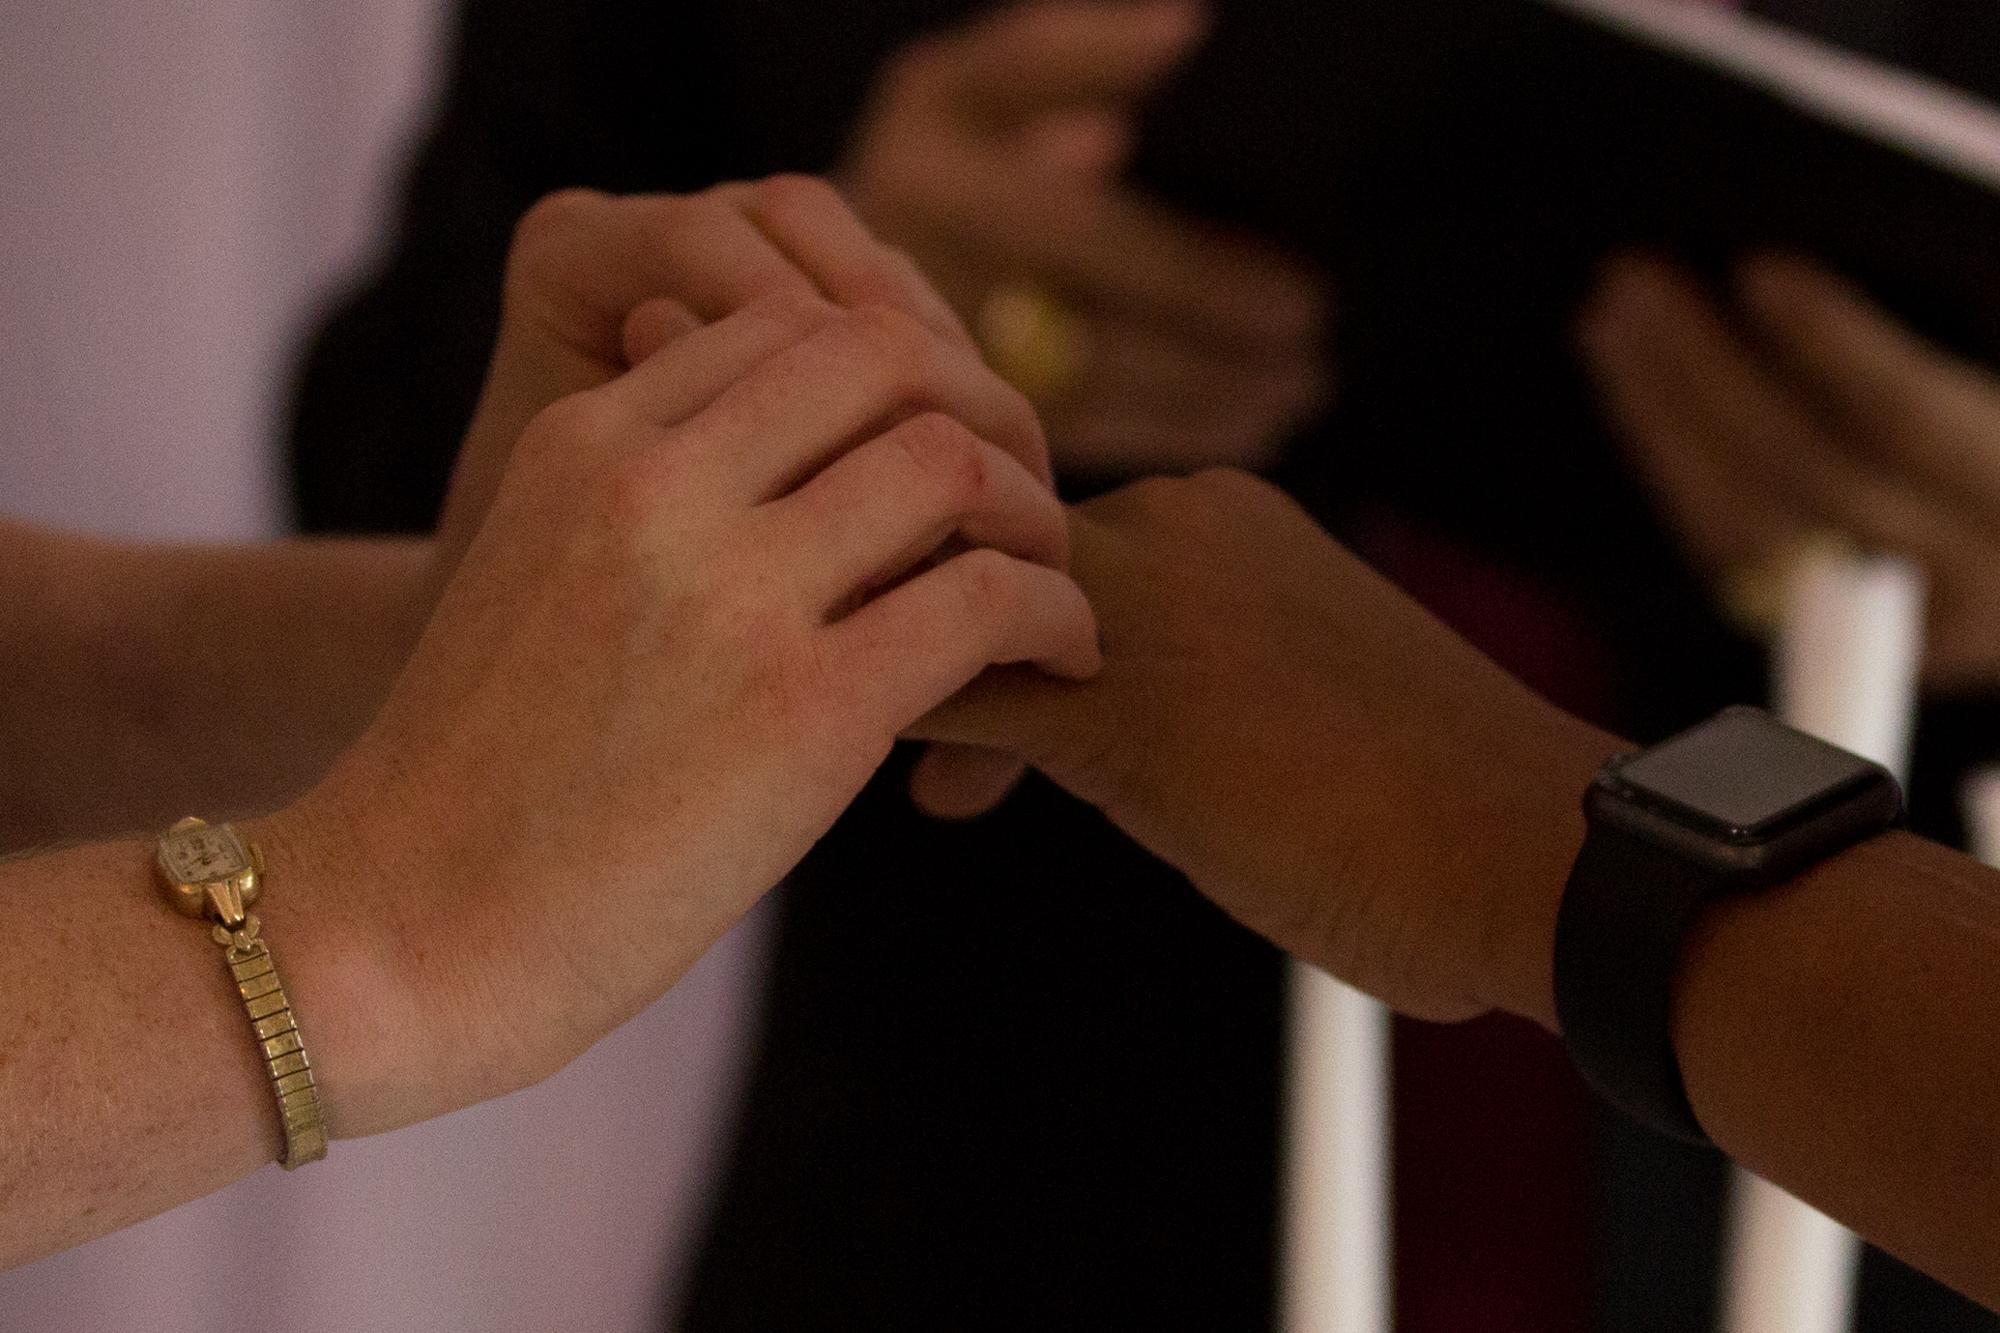 Colleen Stavrakos Wedding Photography exchanging rings